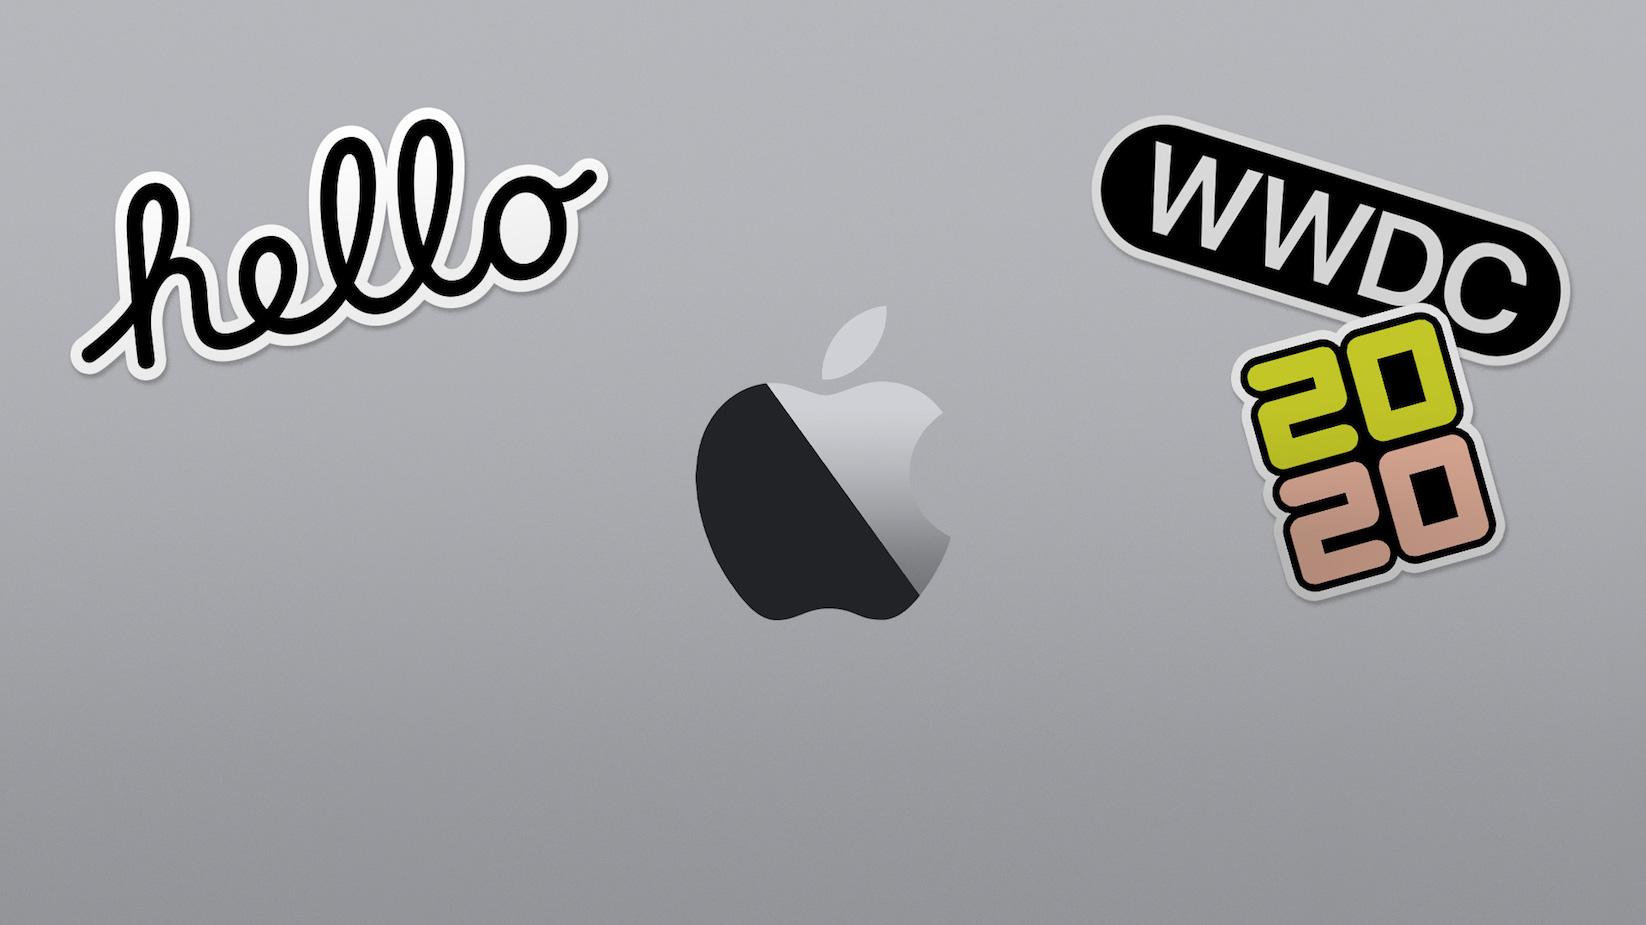 「WWDC 2020」が6月に開催、今年はオンラインイベントに